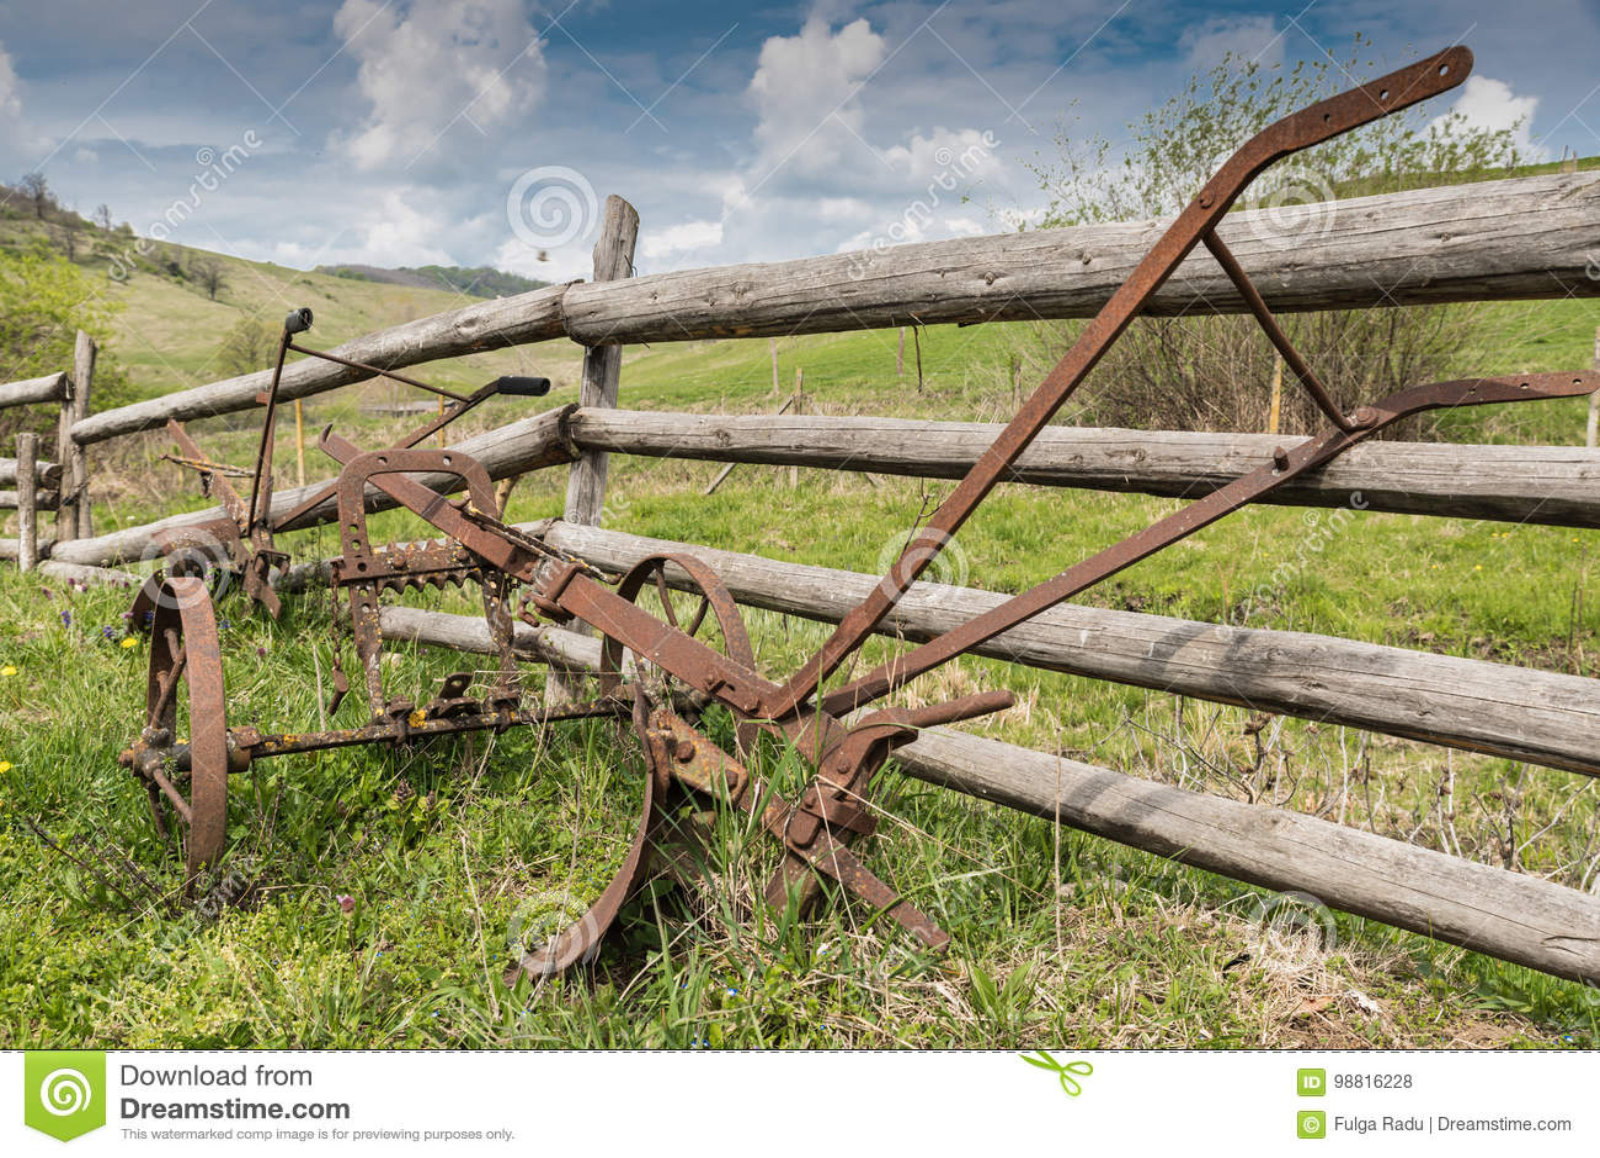 Old plowing tool